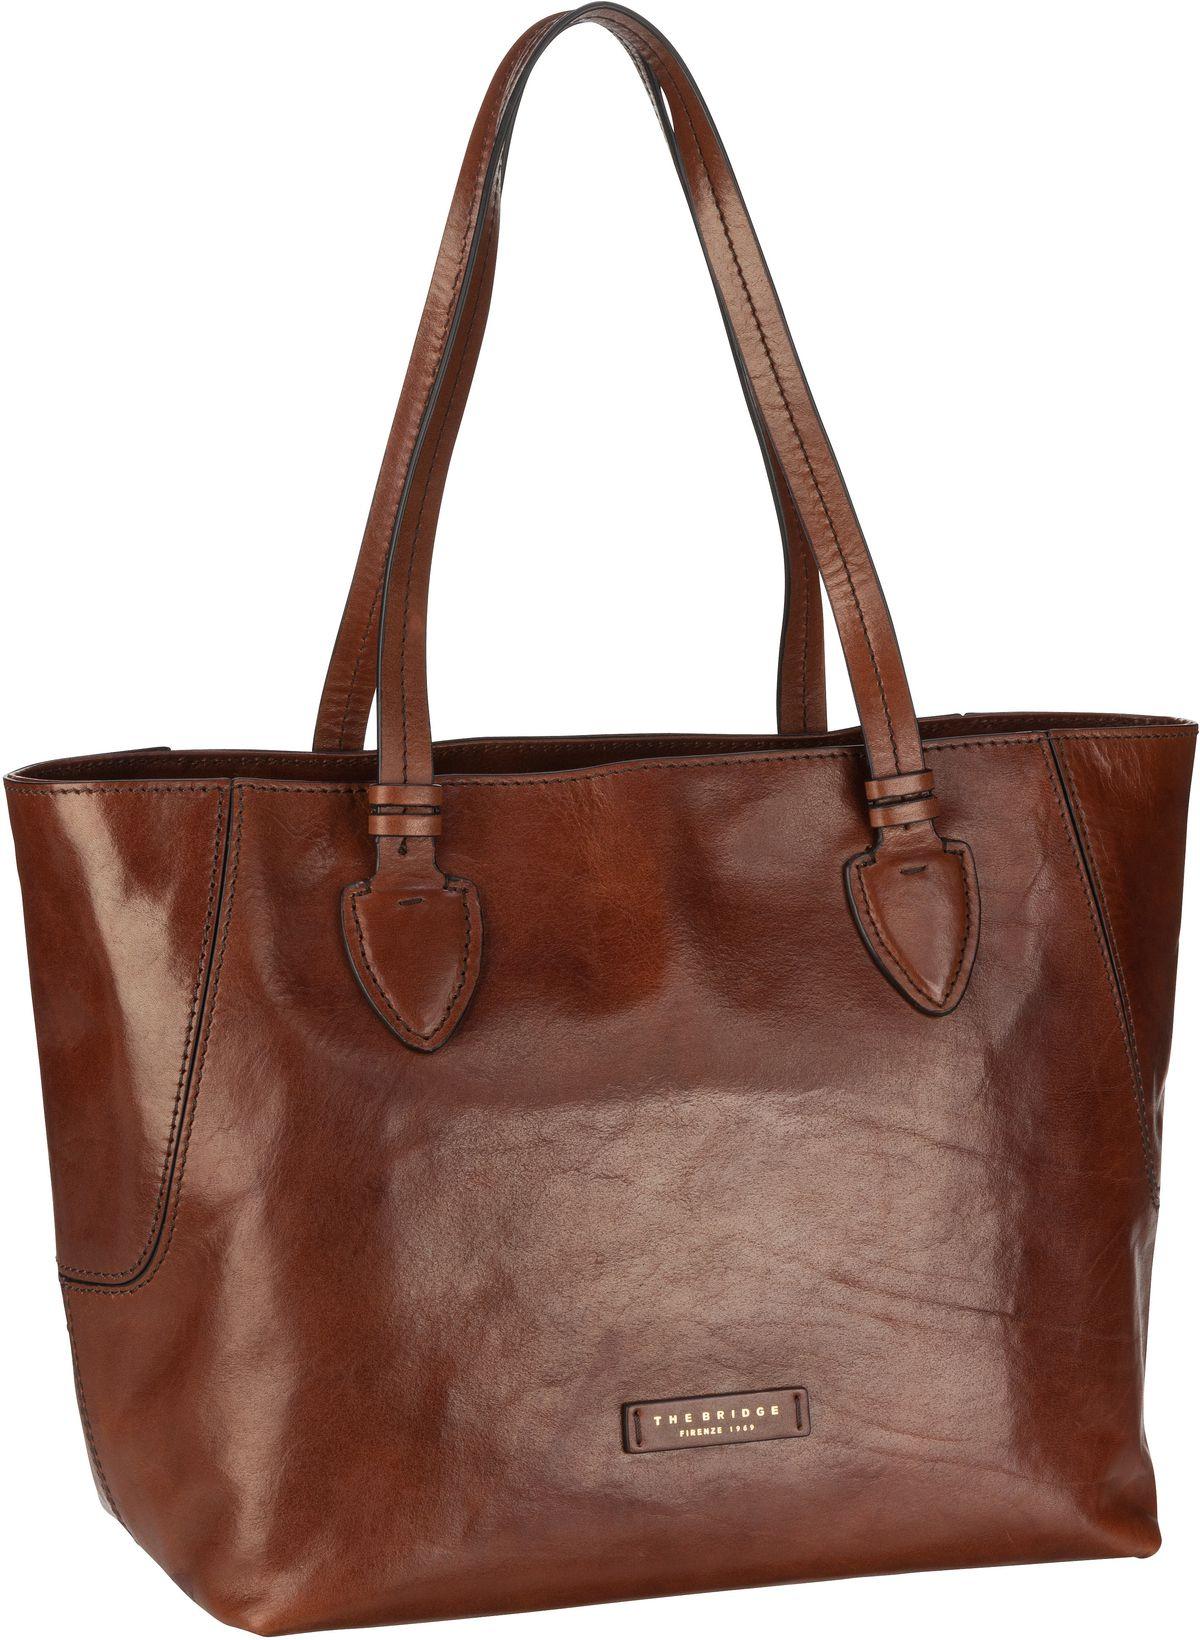 Handtasche Caterina 4730 Marrone/Oro